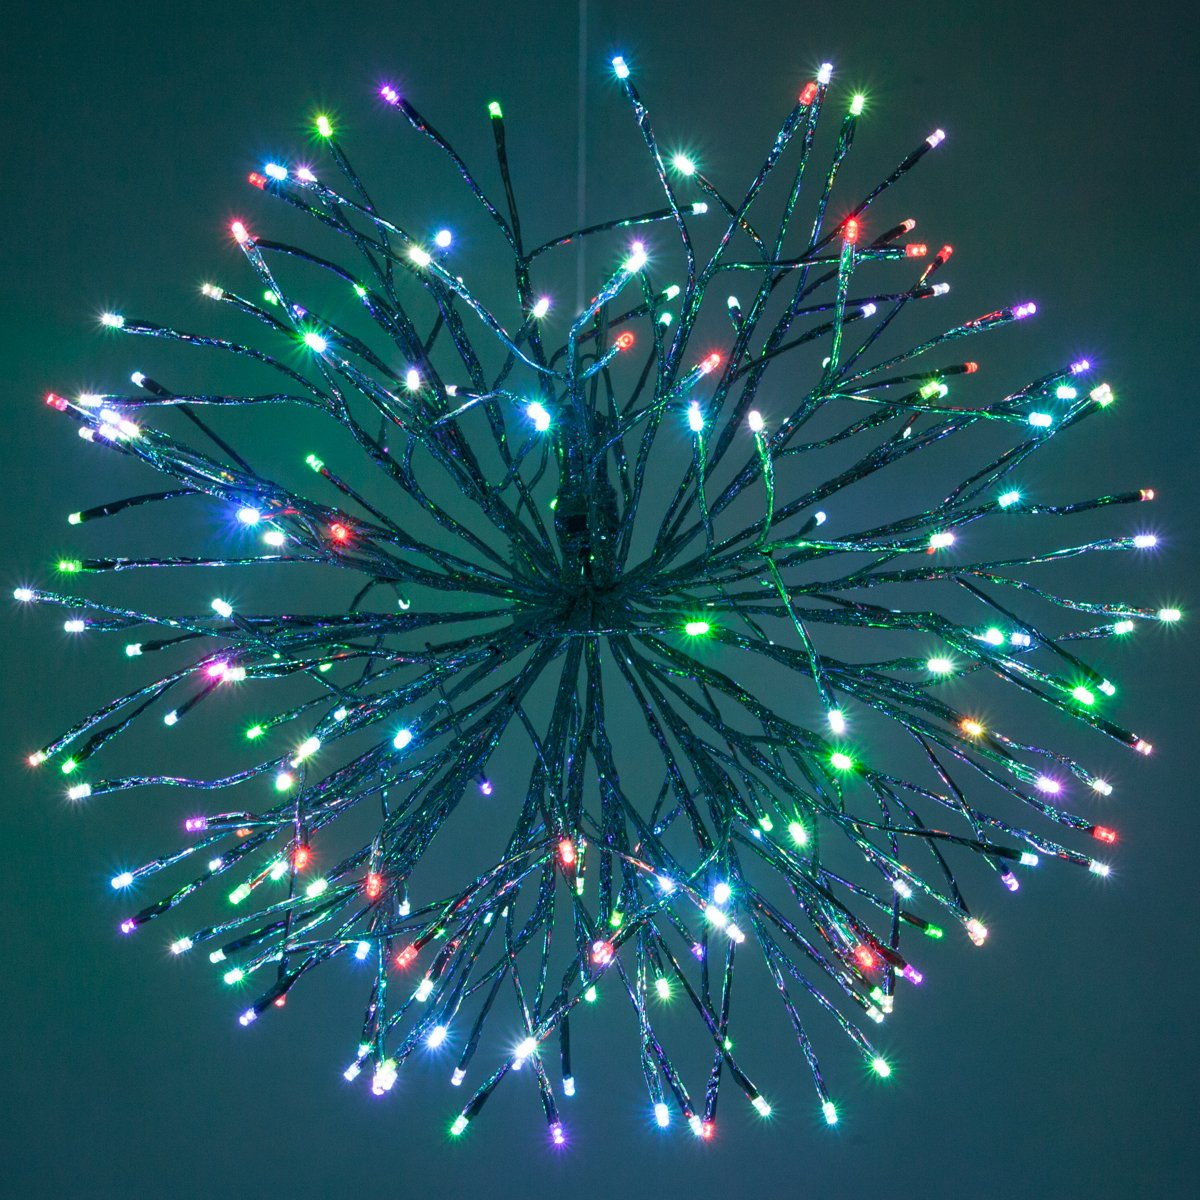 Christmas Light Balls.Cheap Silver Led Starburst 5mm Multicolor Ball Of Lights Christmas Light Balls 24 Silver Branches Multicolor Twinkle Lights Reviews Video